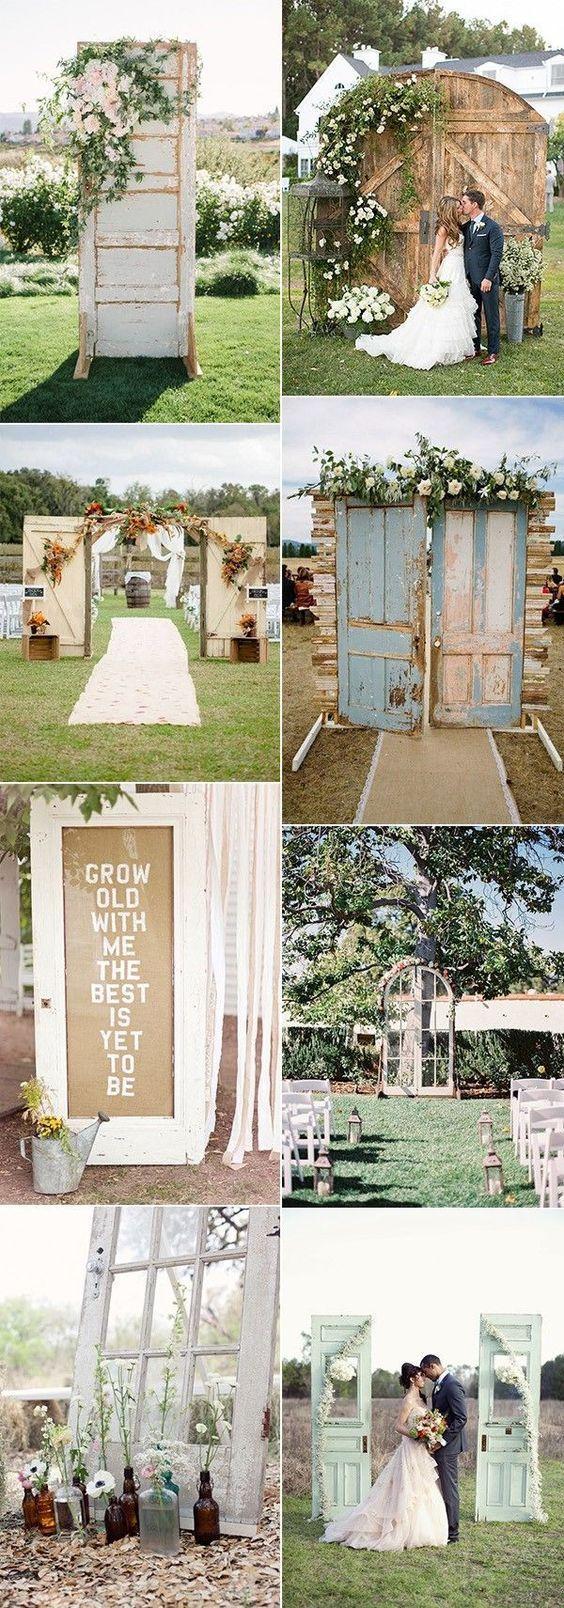 backyard wedding ceremony decoration ideas%0A chic rustic wedding decoration ideas with old doors